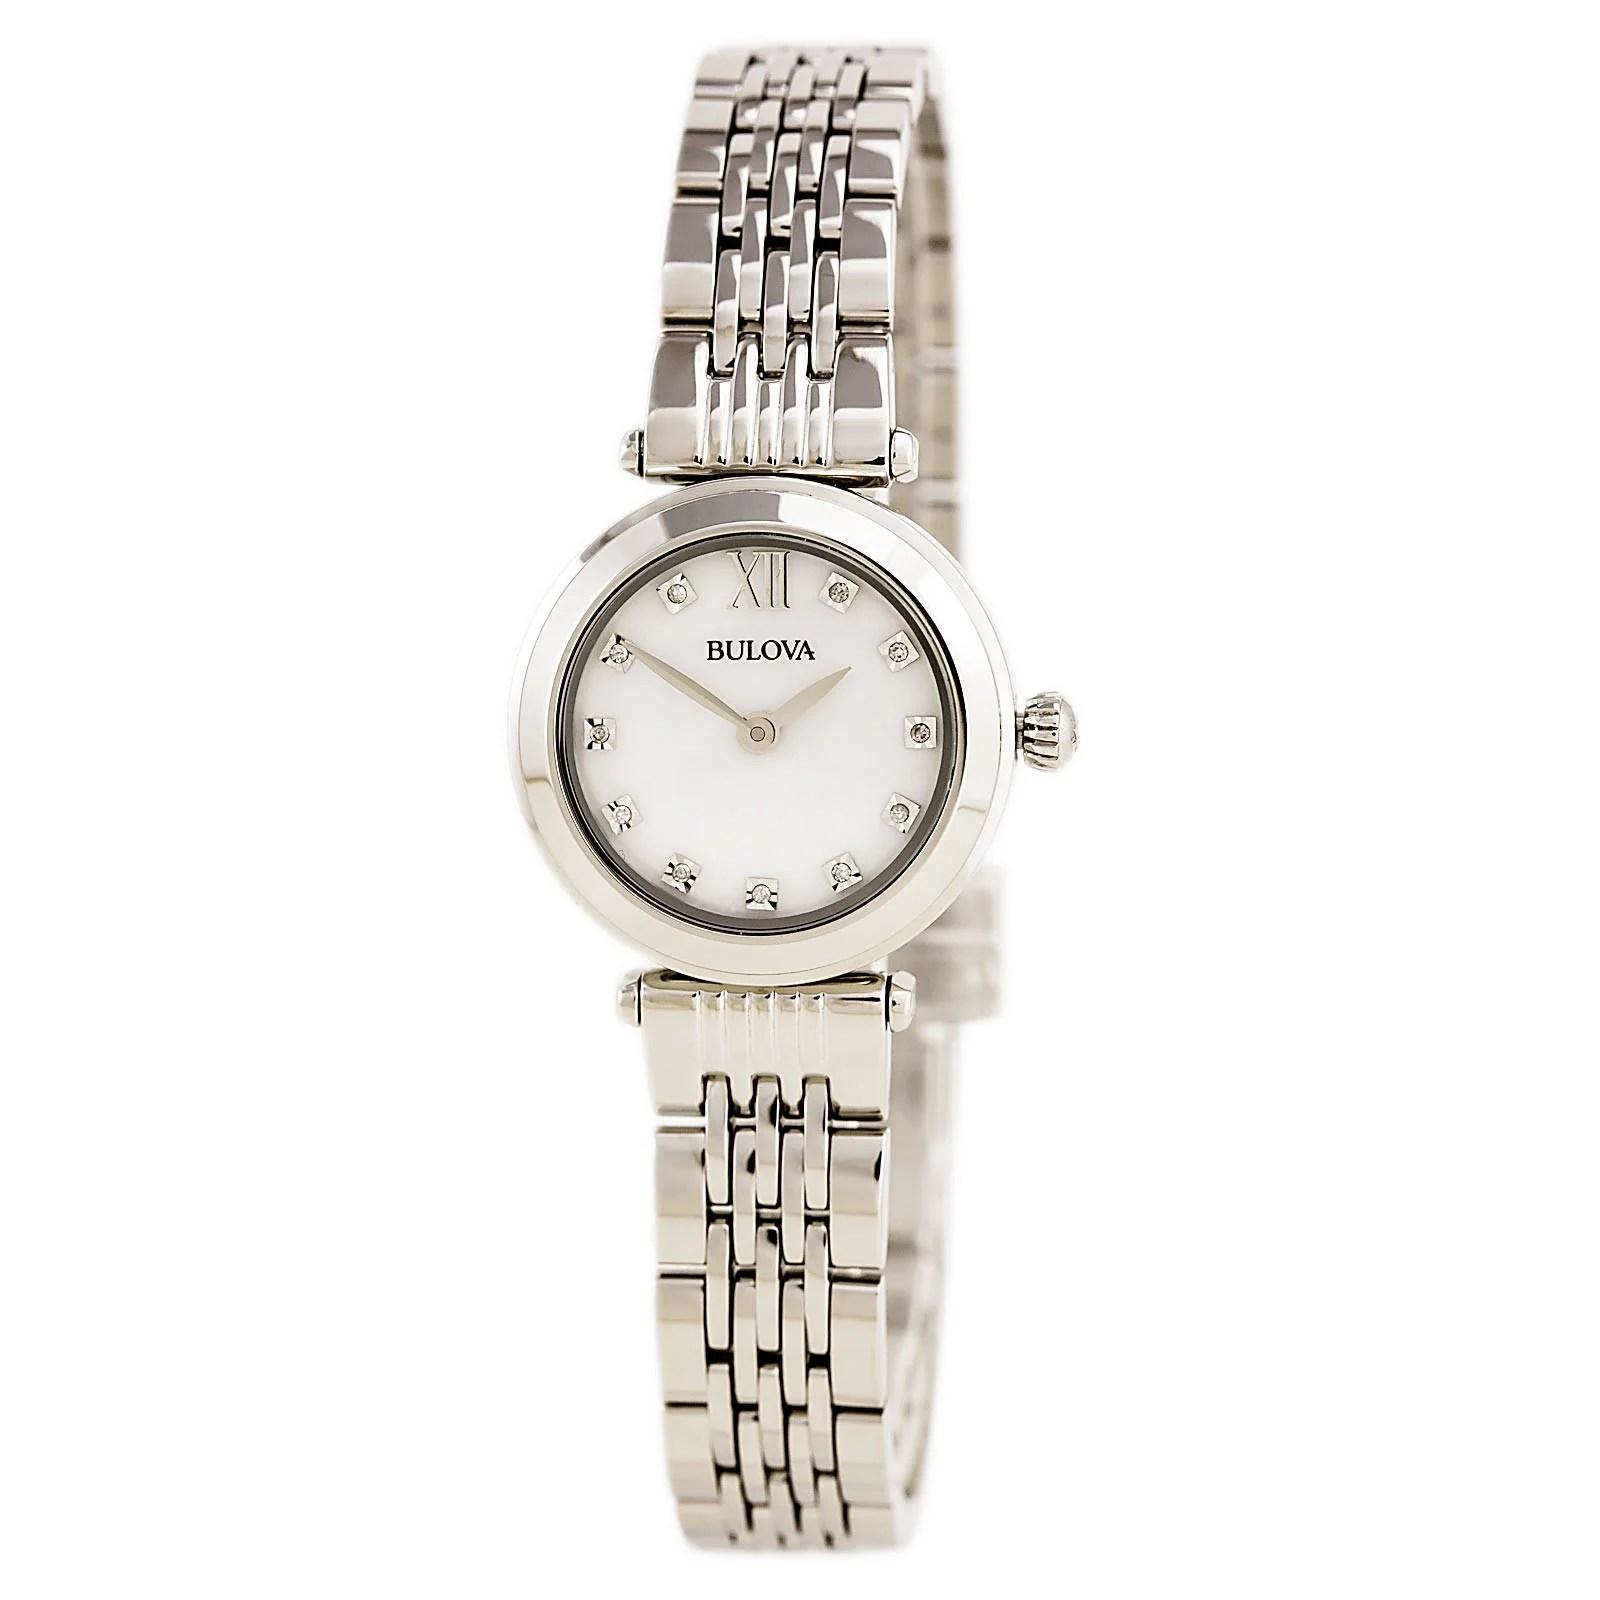 Bulova 96P167 Lady's Diamond White MOP Dial Steel Bracelet Watch